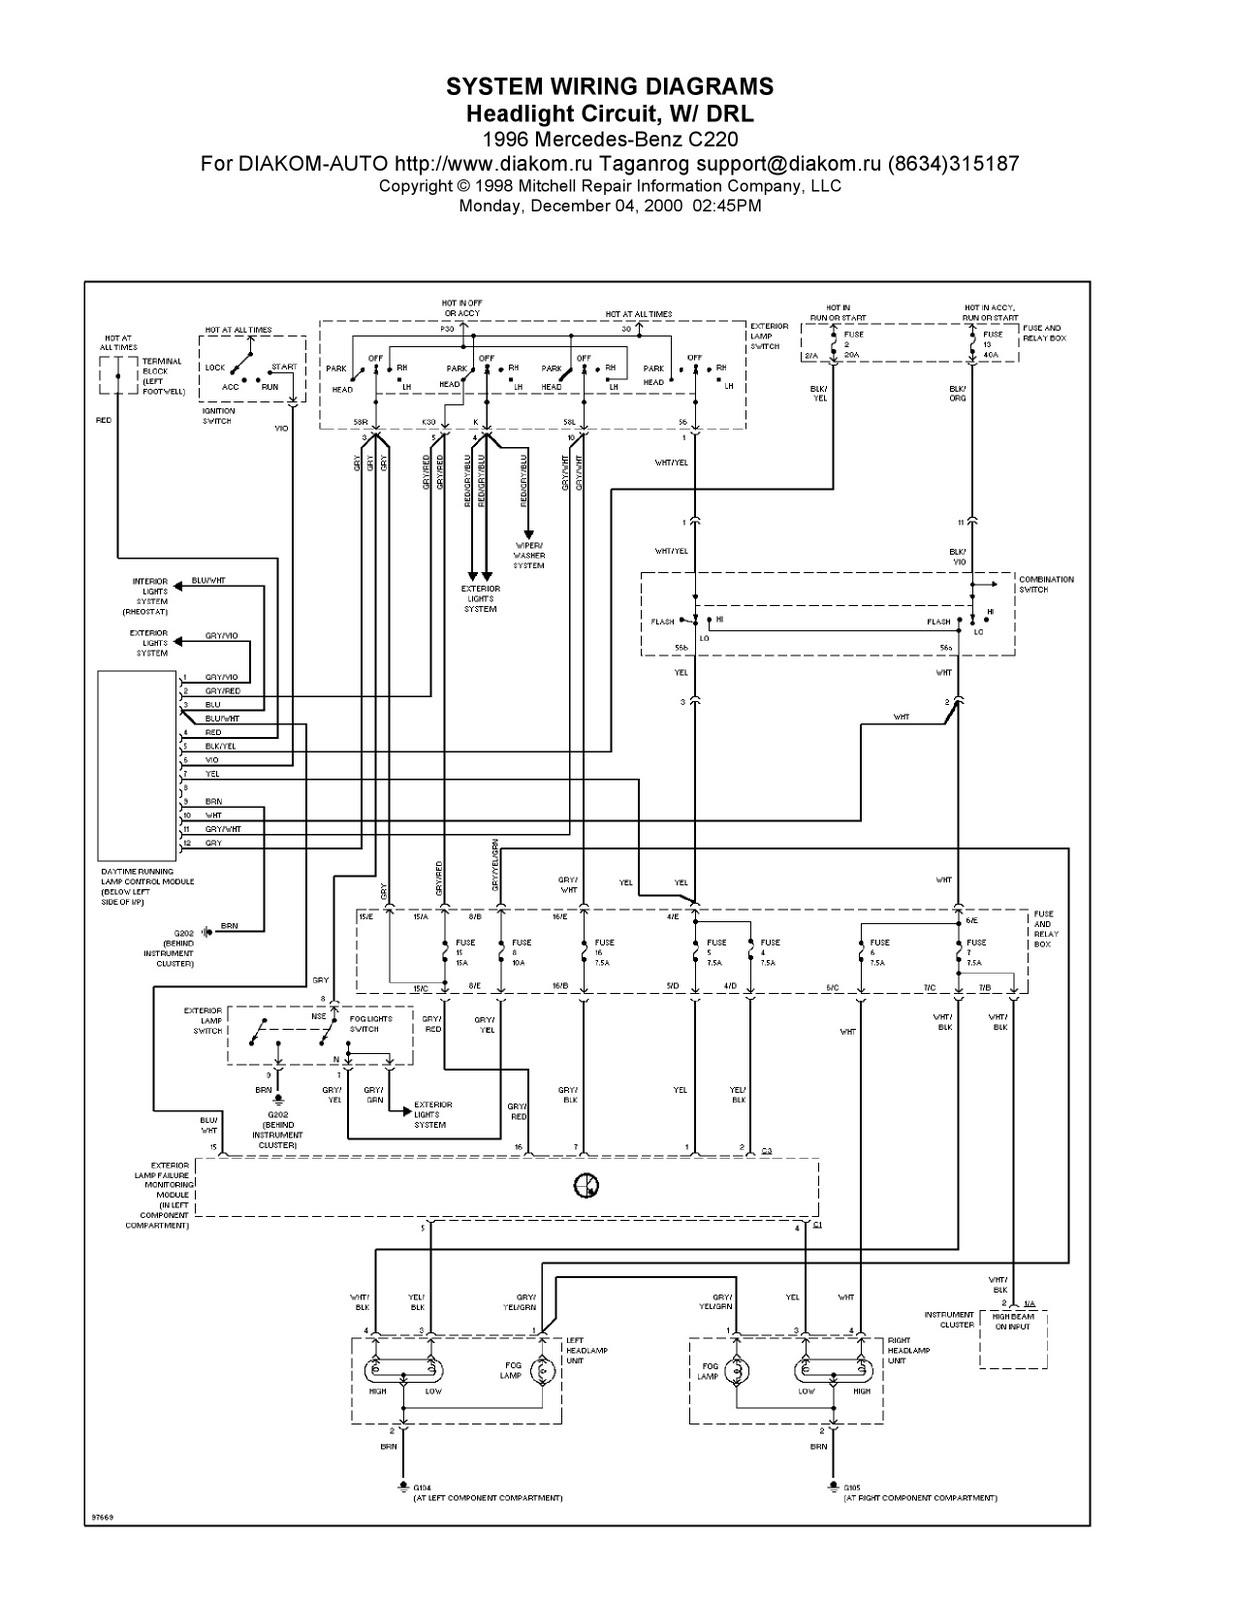 1996 mercedes c220 fuse box